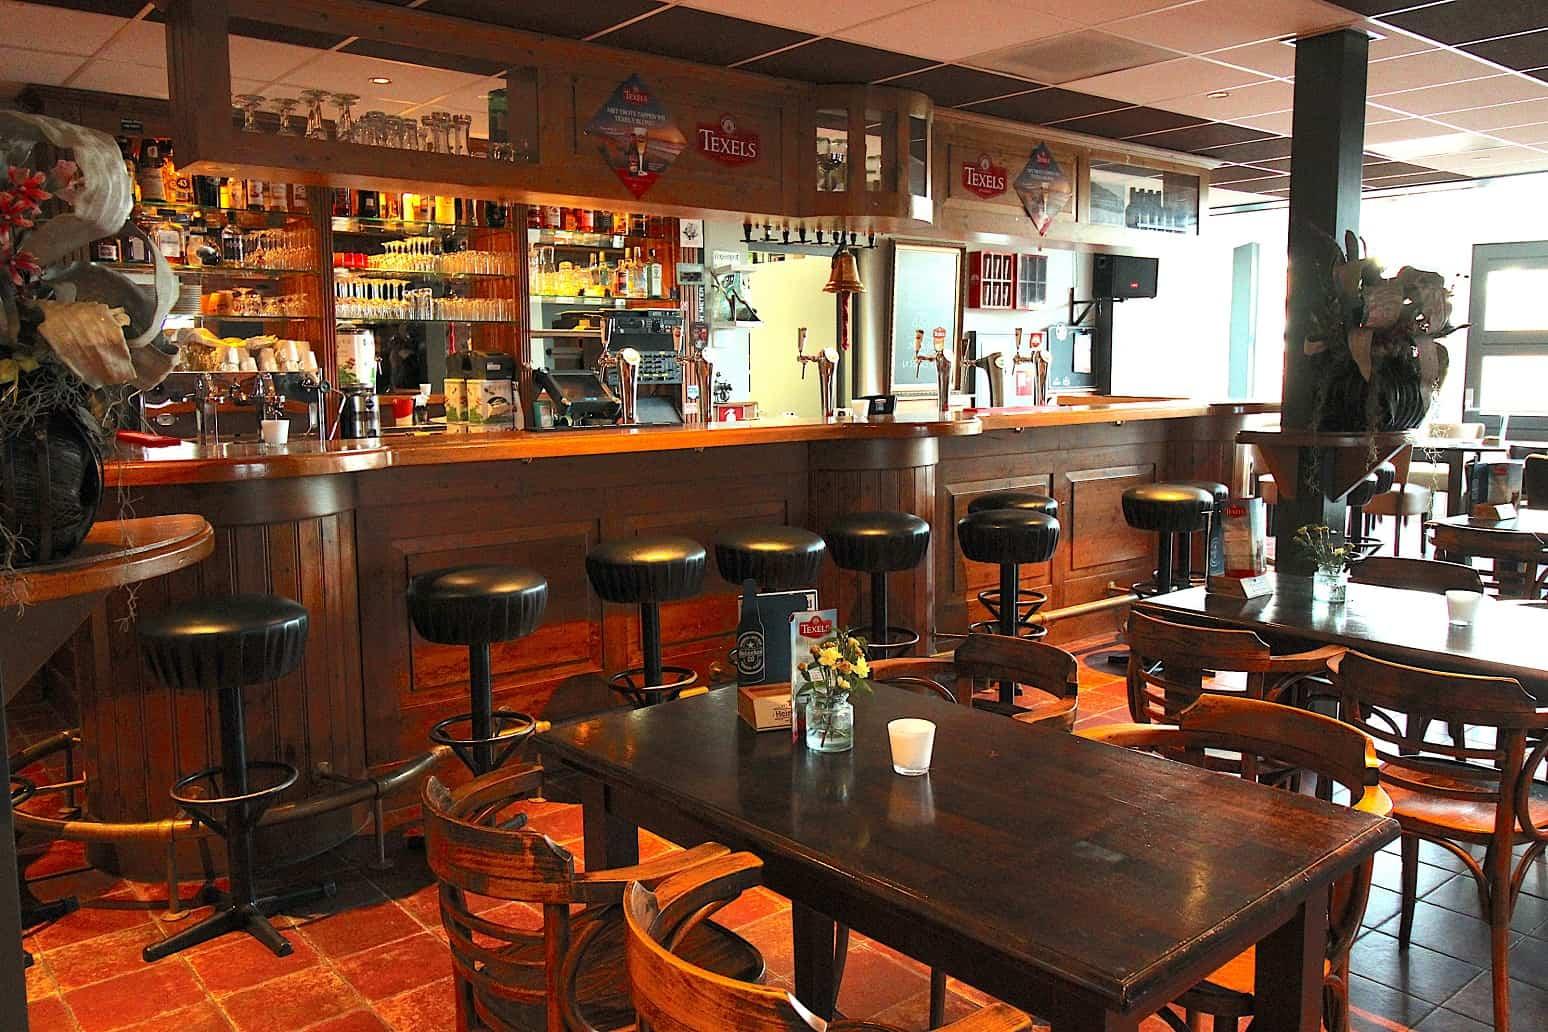 Eetcafé in Dirkshorn Noord-Holland